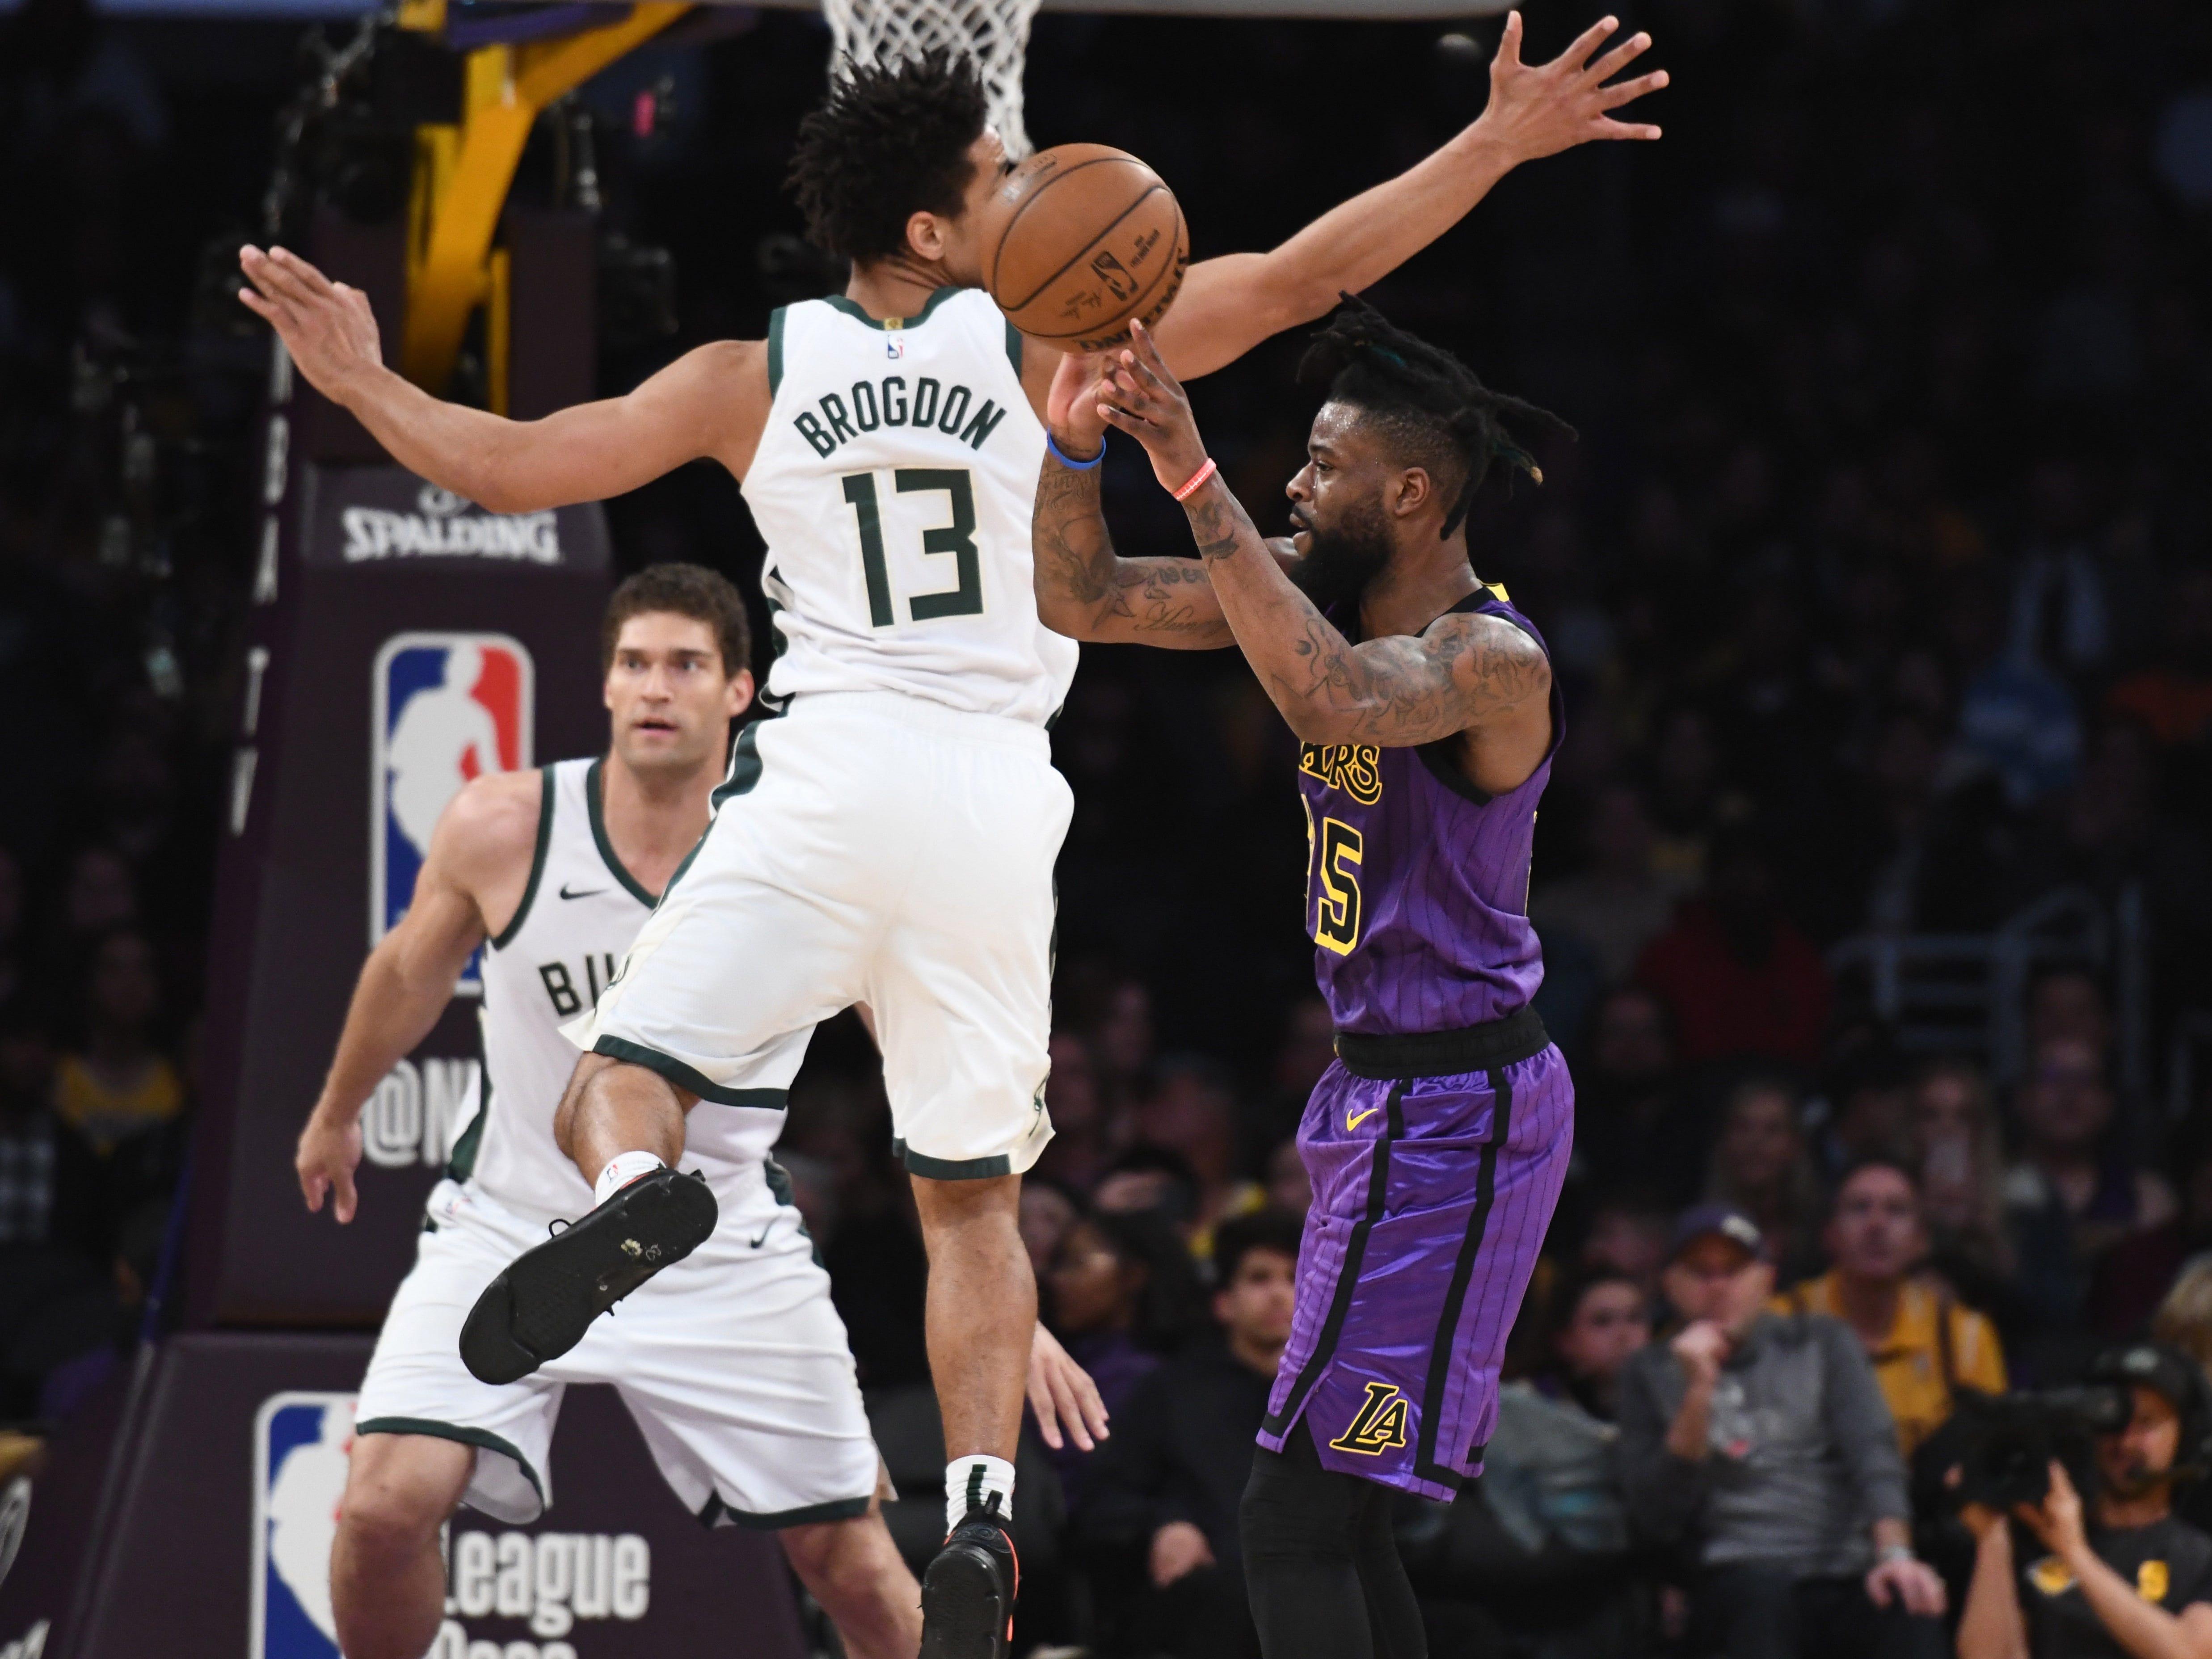 Lakers guard Reggie Bullock passes the ball as Bucks guard Malcolm Brogdon goes flying past himem during the fourth quarter.